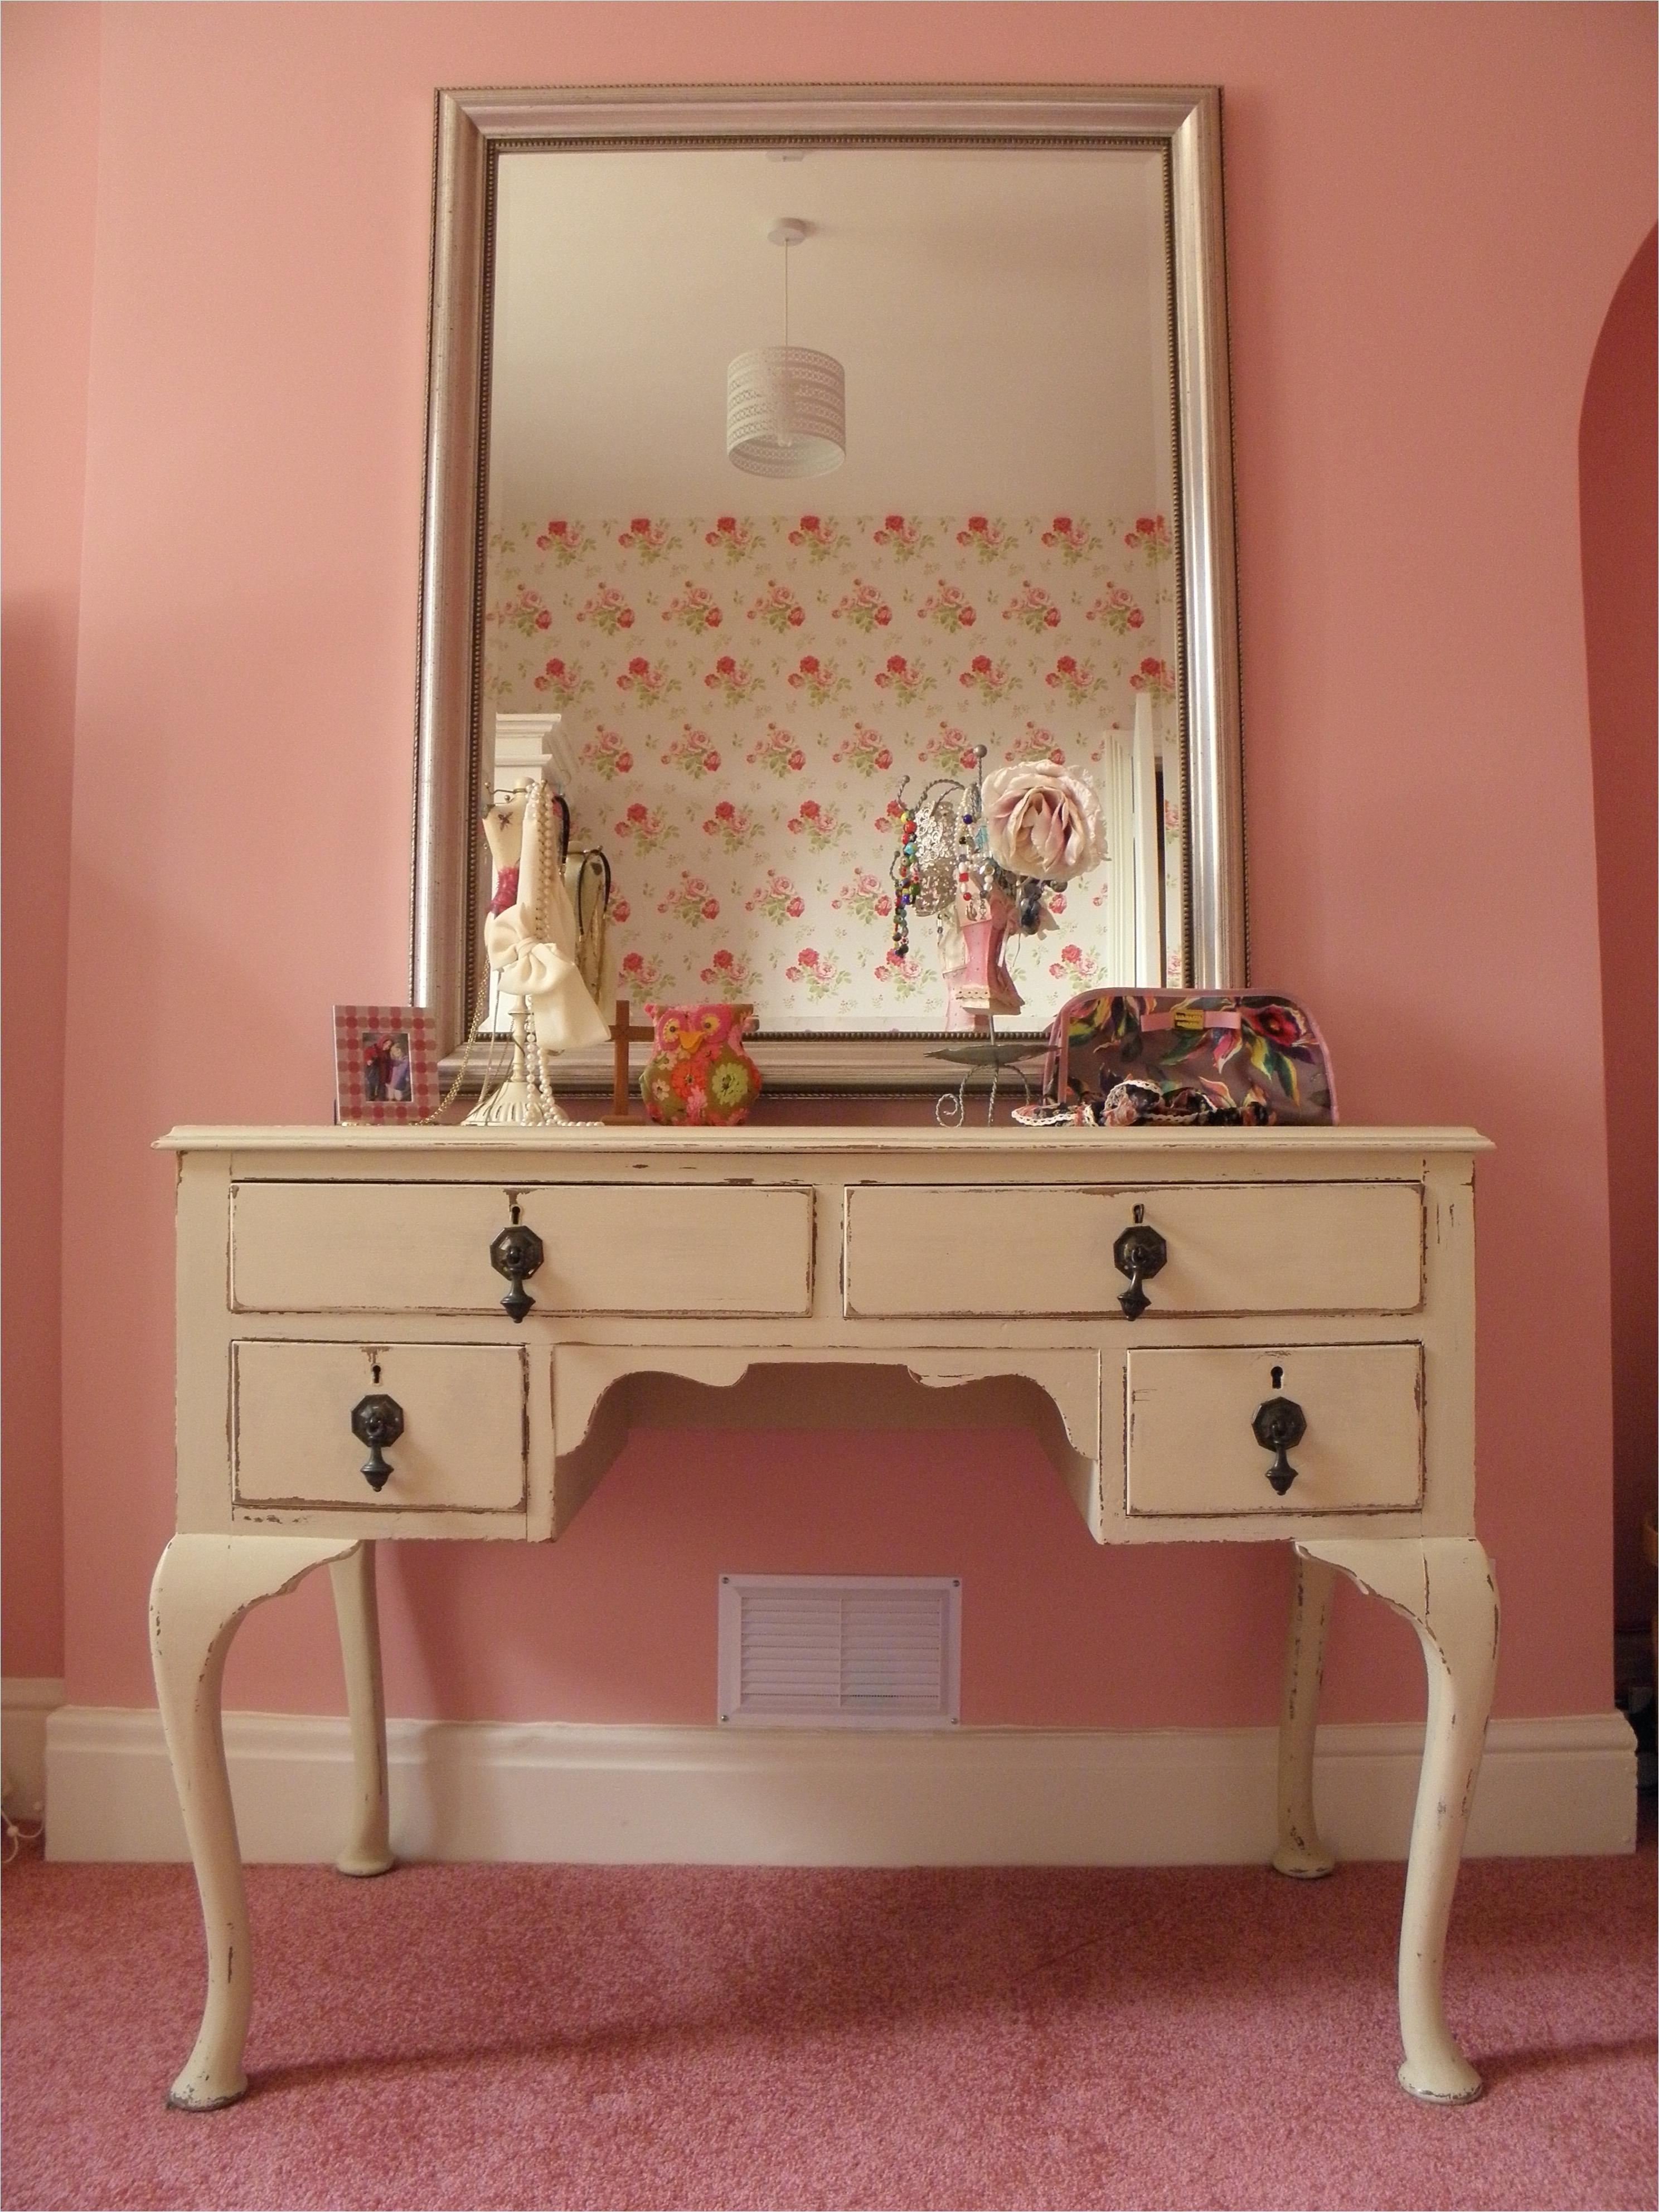 diy vanity table plans fresh latest design for dressing table vanity ideas furniture enthralling